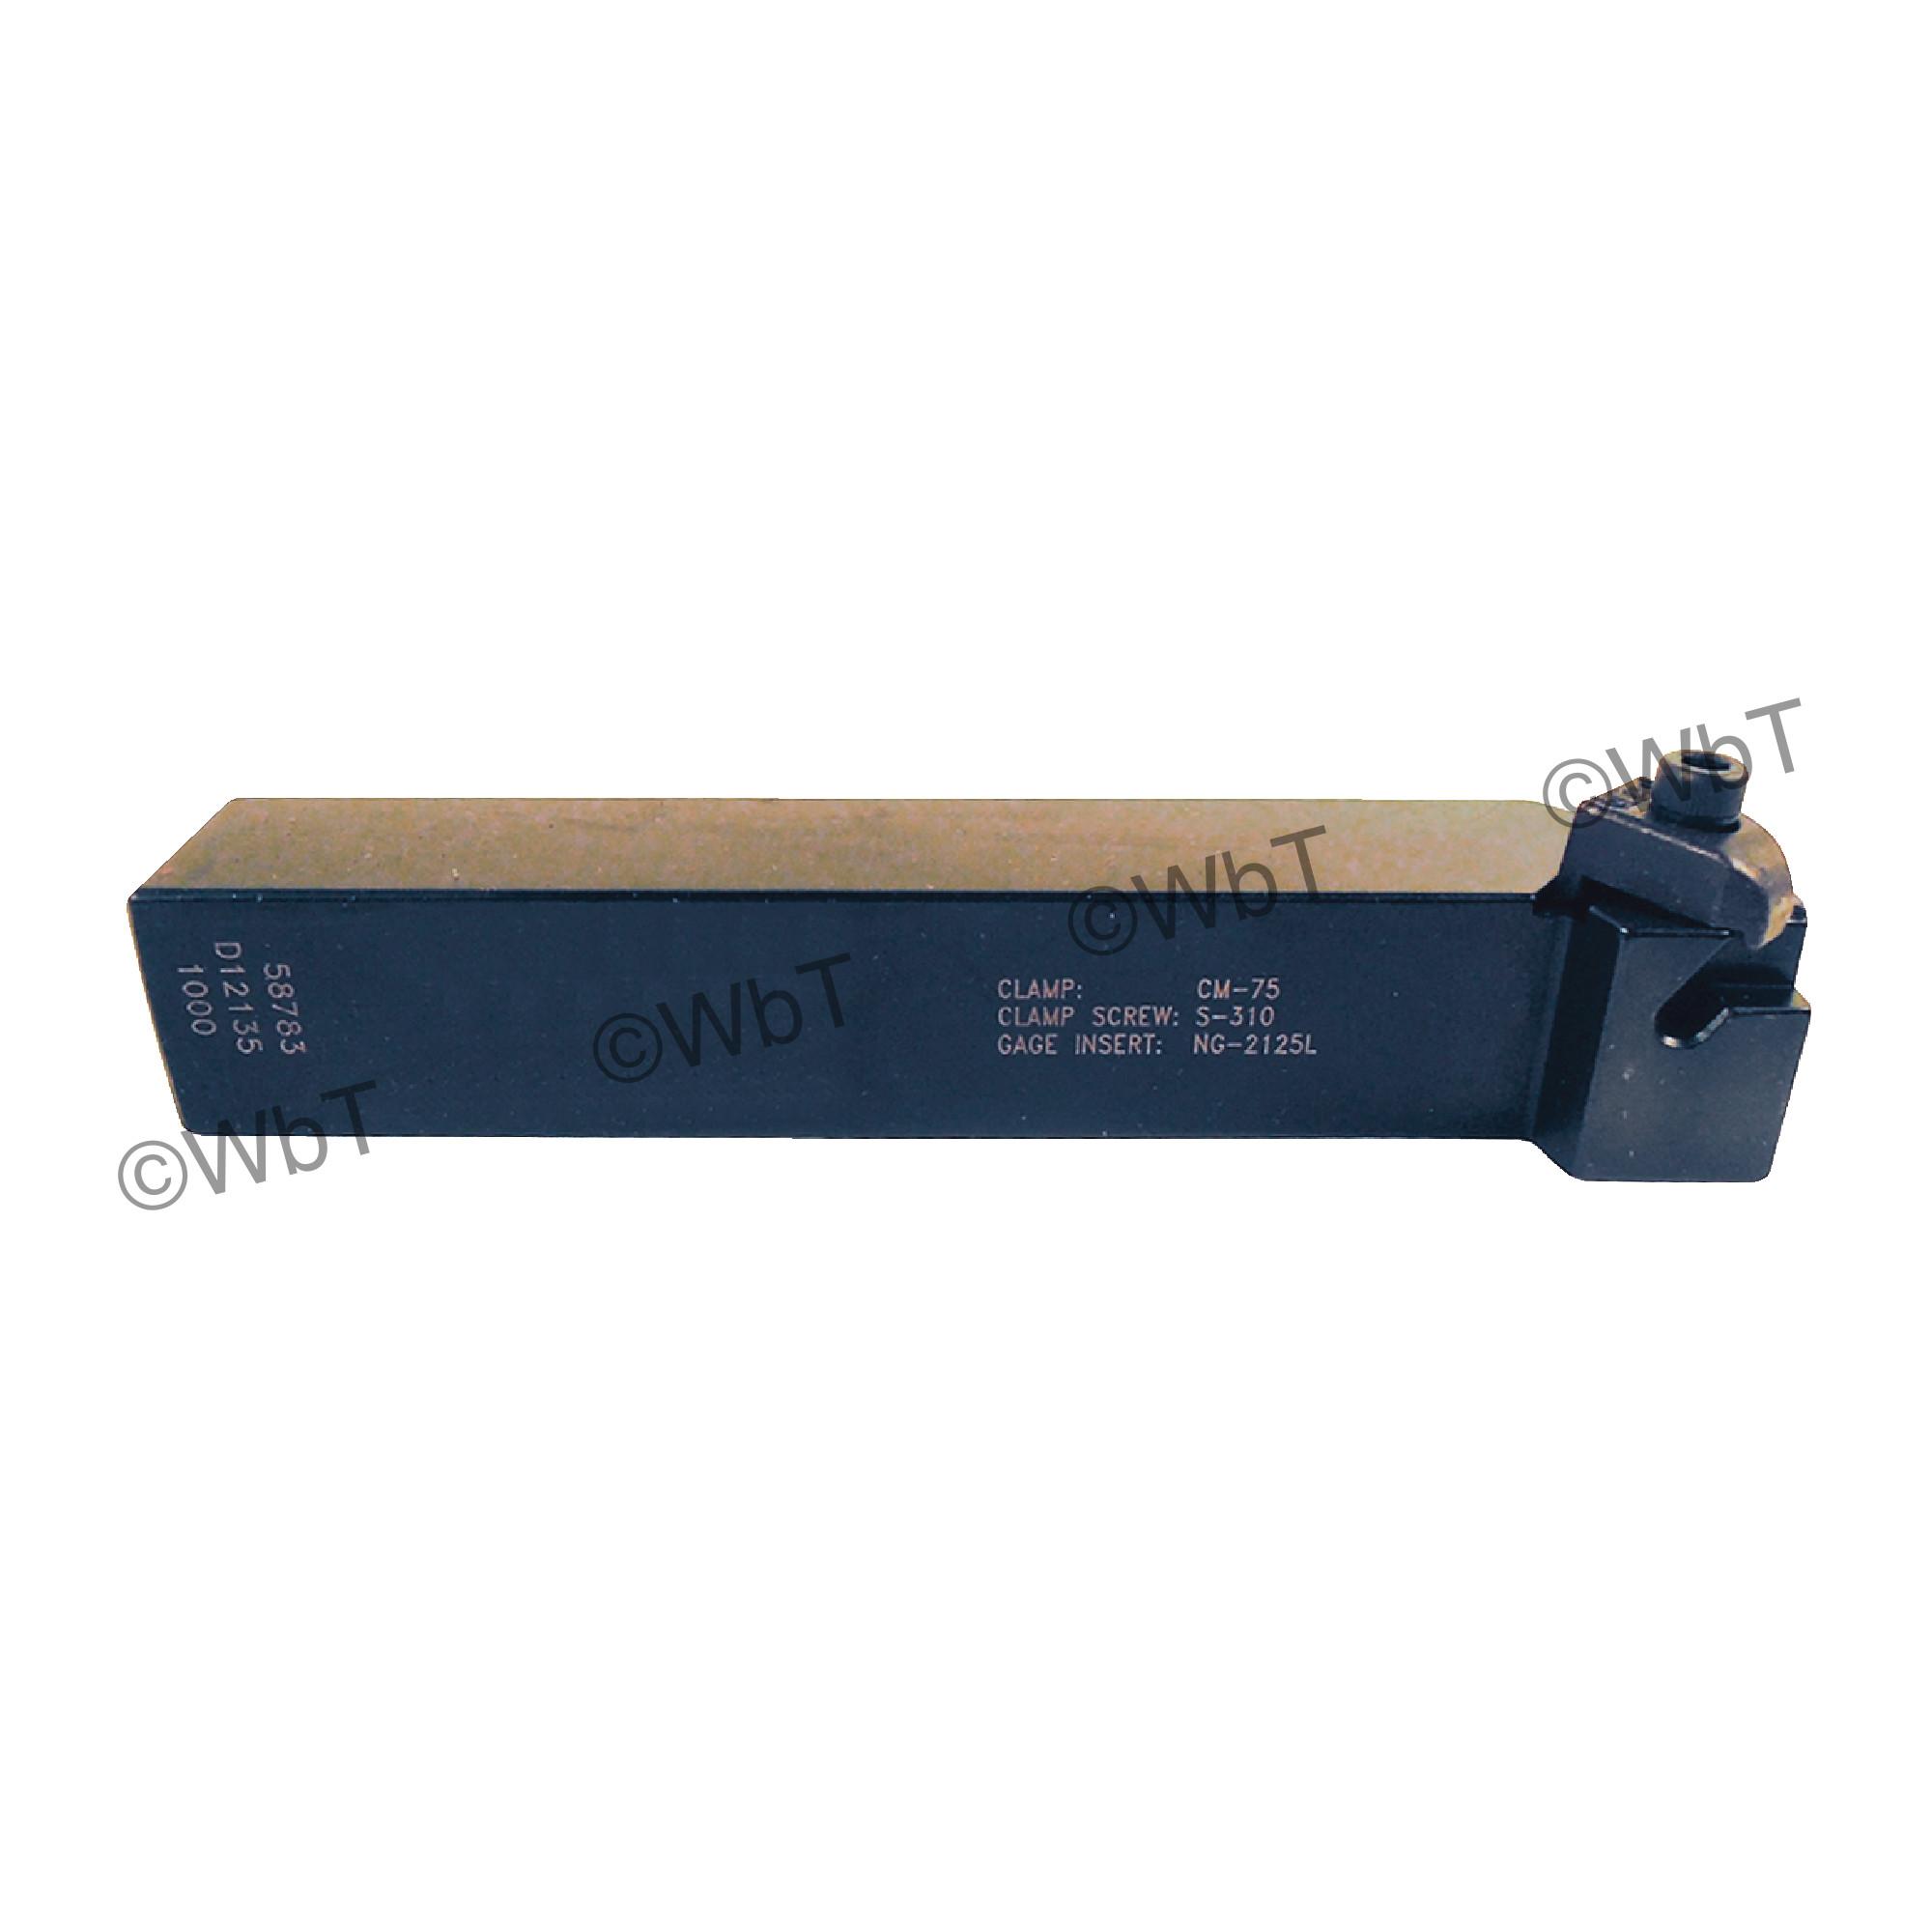 "TTC PRODUCTION - TNSL12-2B / 0.750"" Shank External Holder / Size 2 Insert / Left Hand"